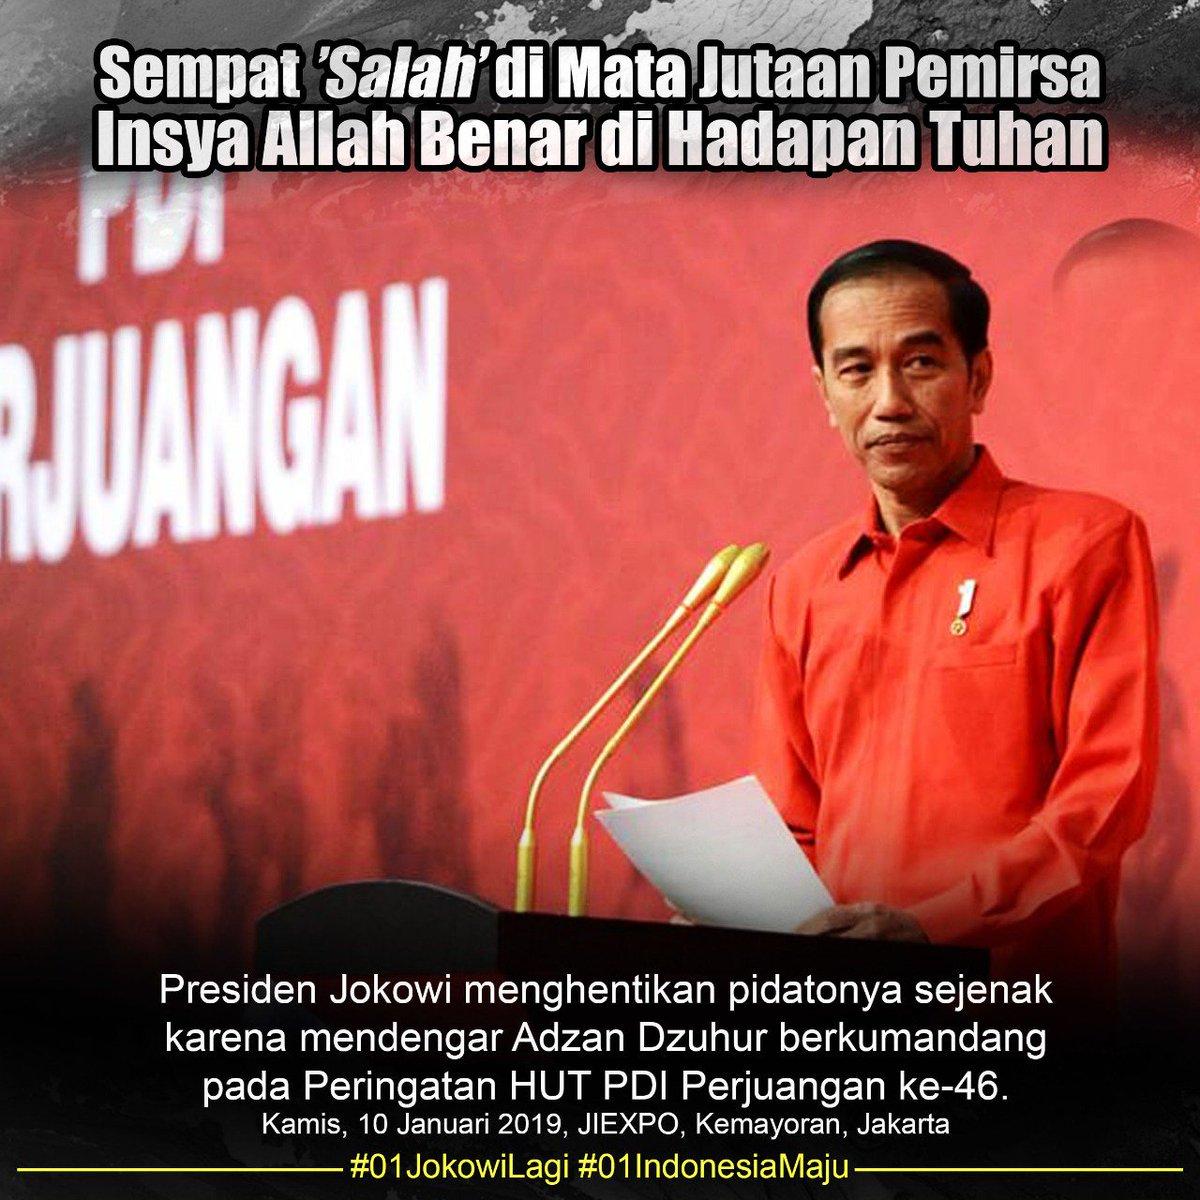 #jokowipresidenku #rekanjokowi #rekanjokowisulsel #ayoteruskerja #indonesiakuat https://t.co/0MmLcLRXK4